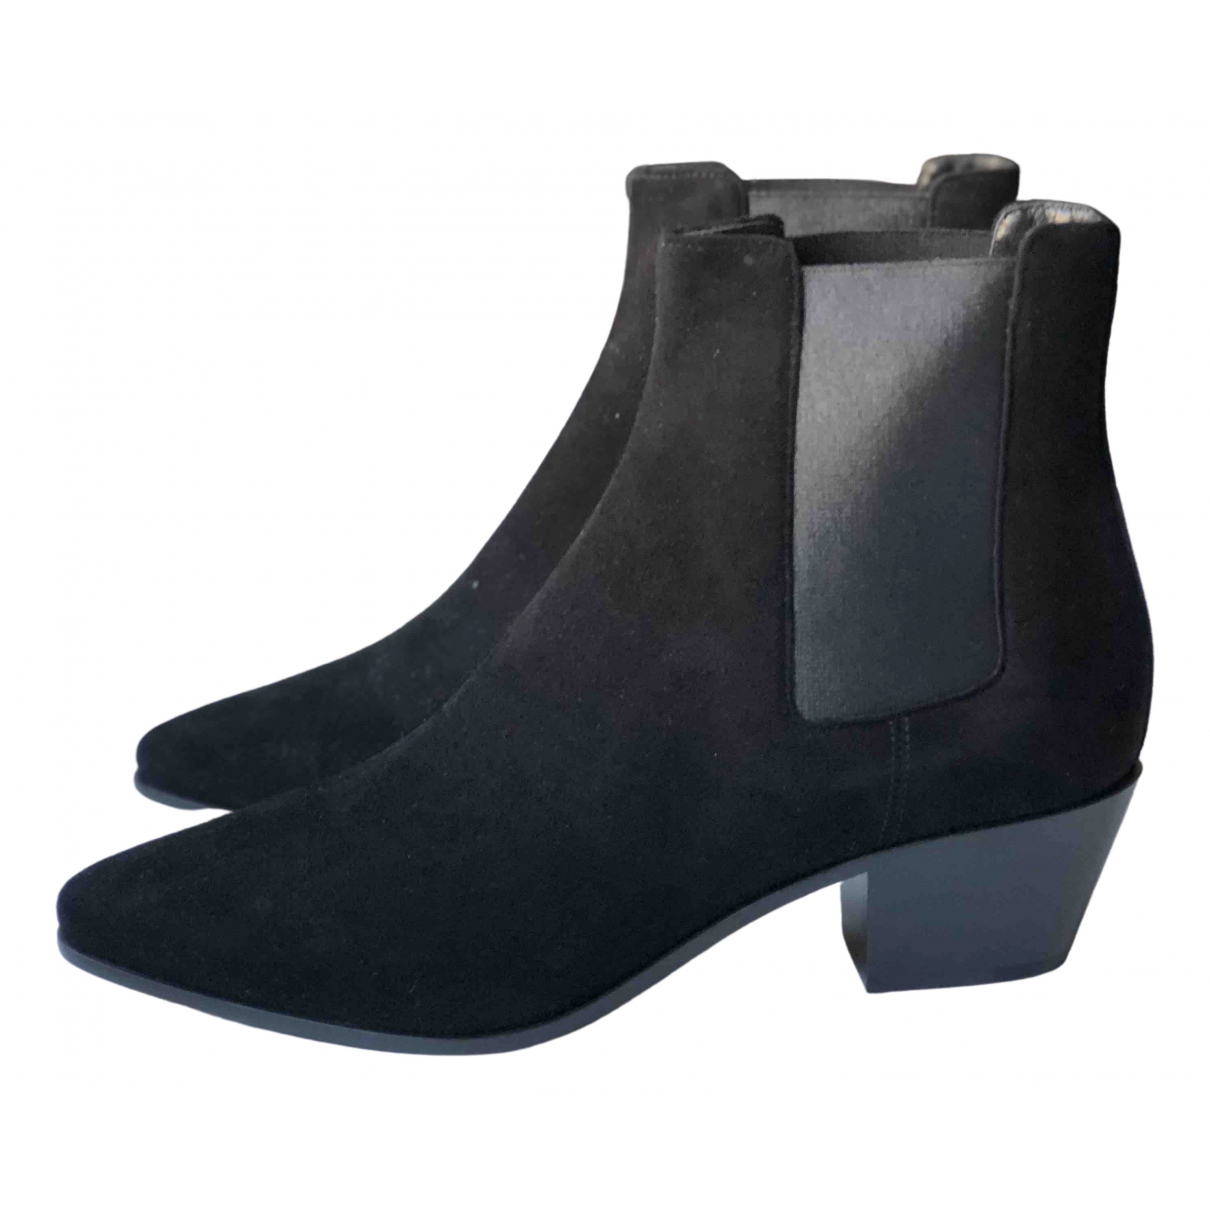 Yves Saint Laurent \N Black Suede Ankle boots for Women 37 EU